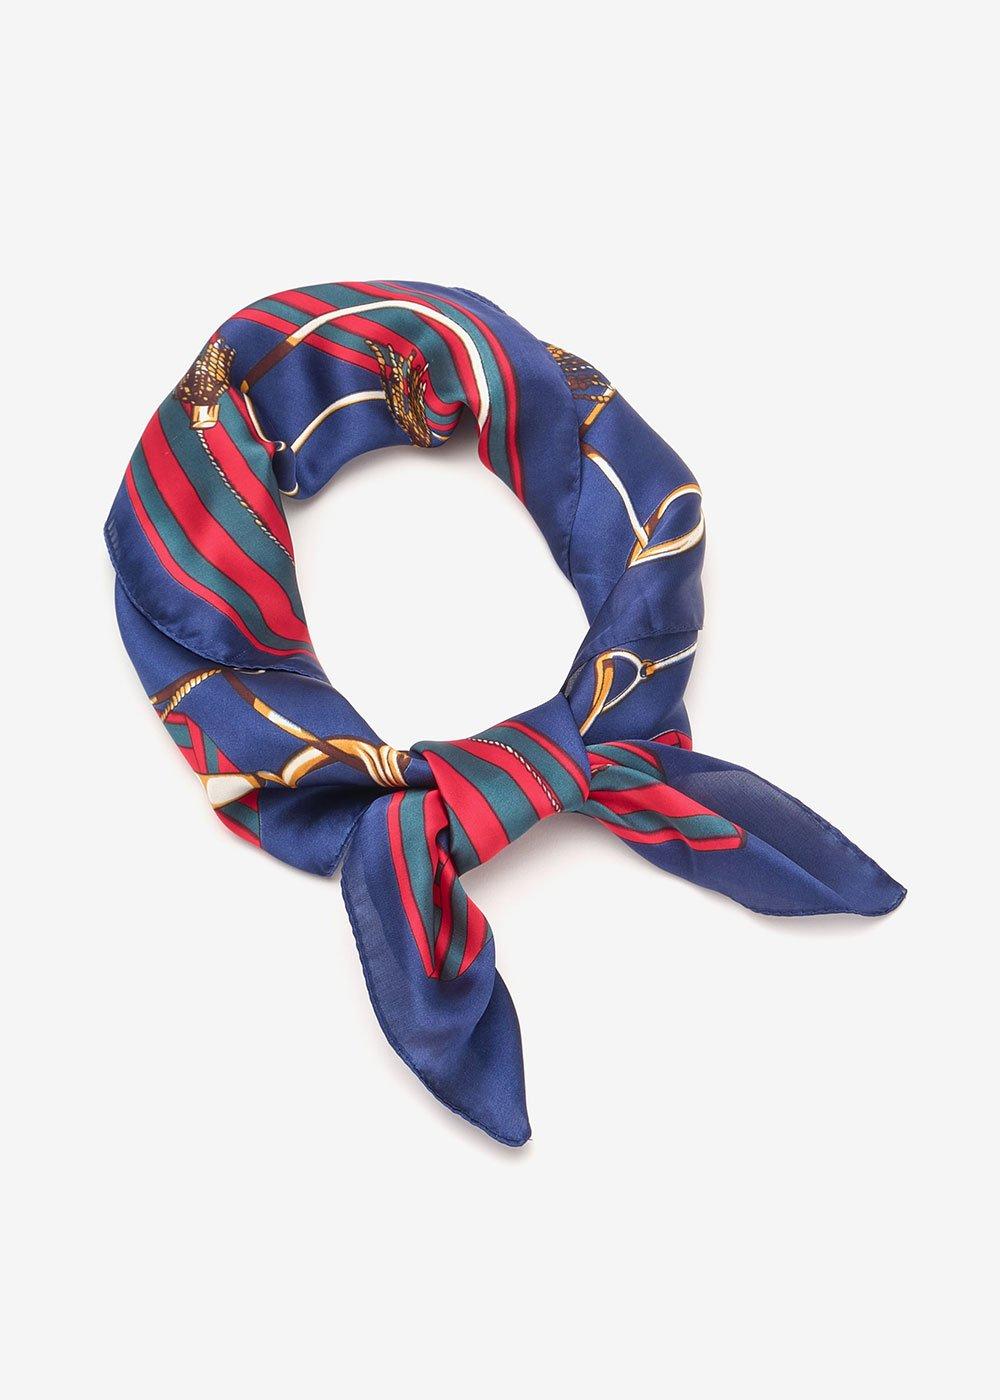 Sherlyn foulard with chain print - Red Blue Multi - Woman